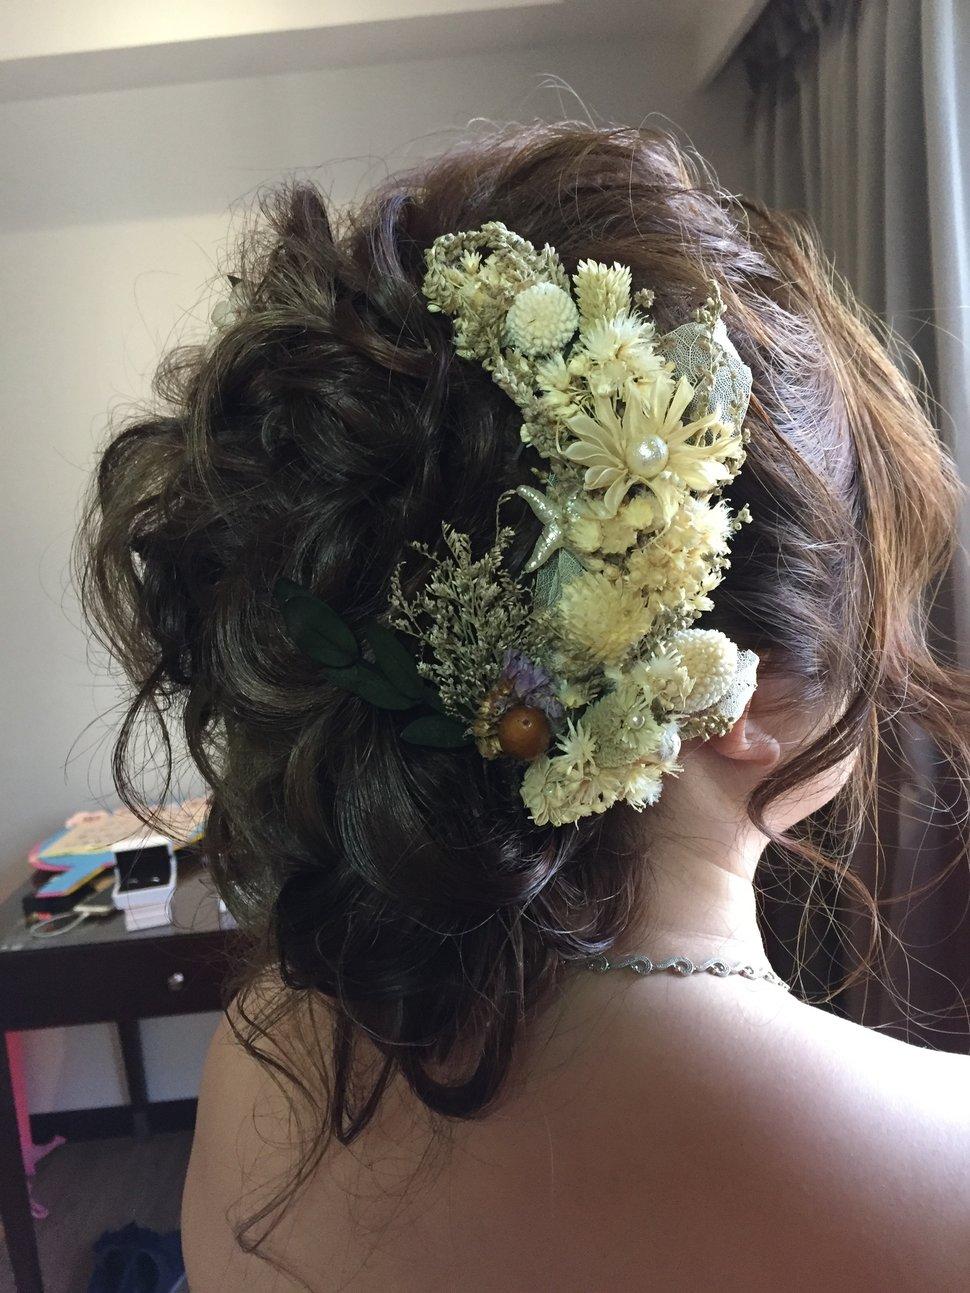 IMG_6172 - Jojo chen Makeup新娘秘書《結婚吧》